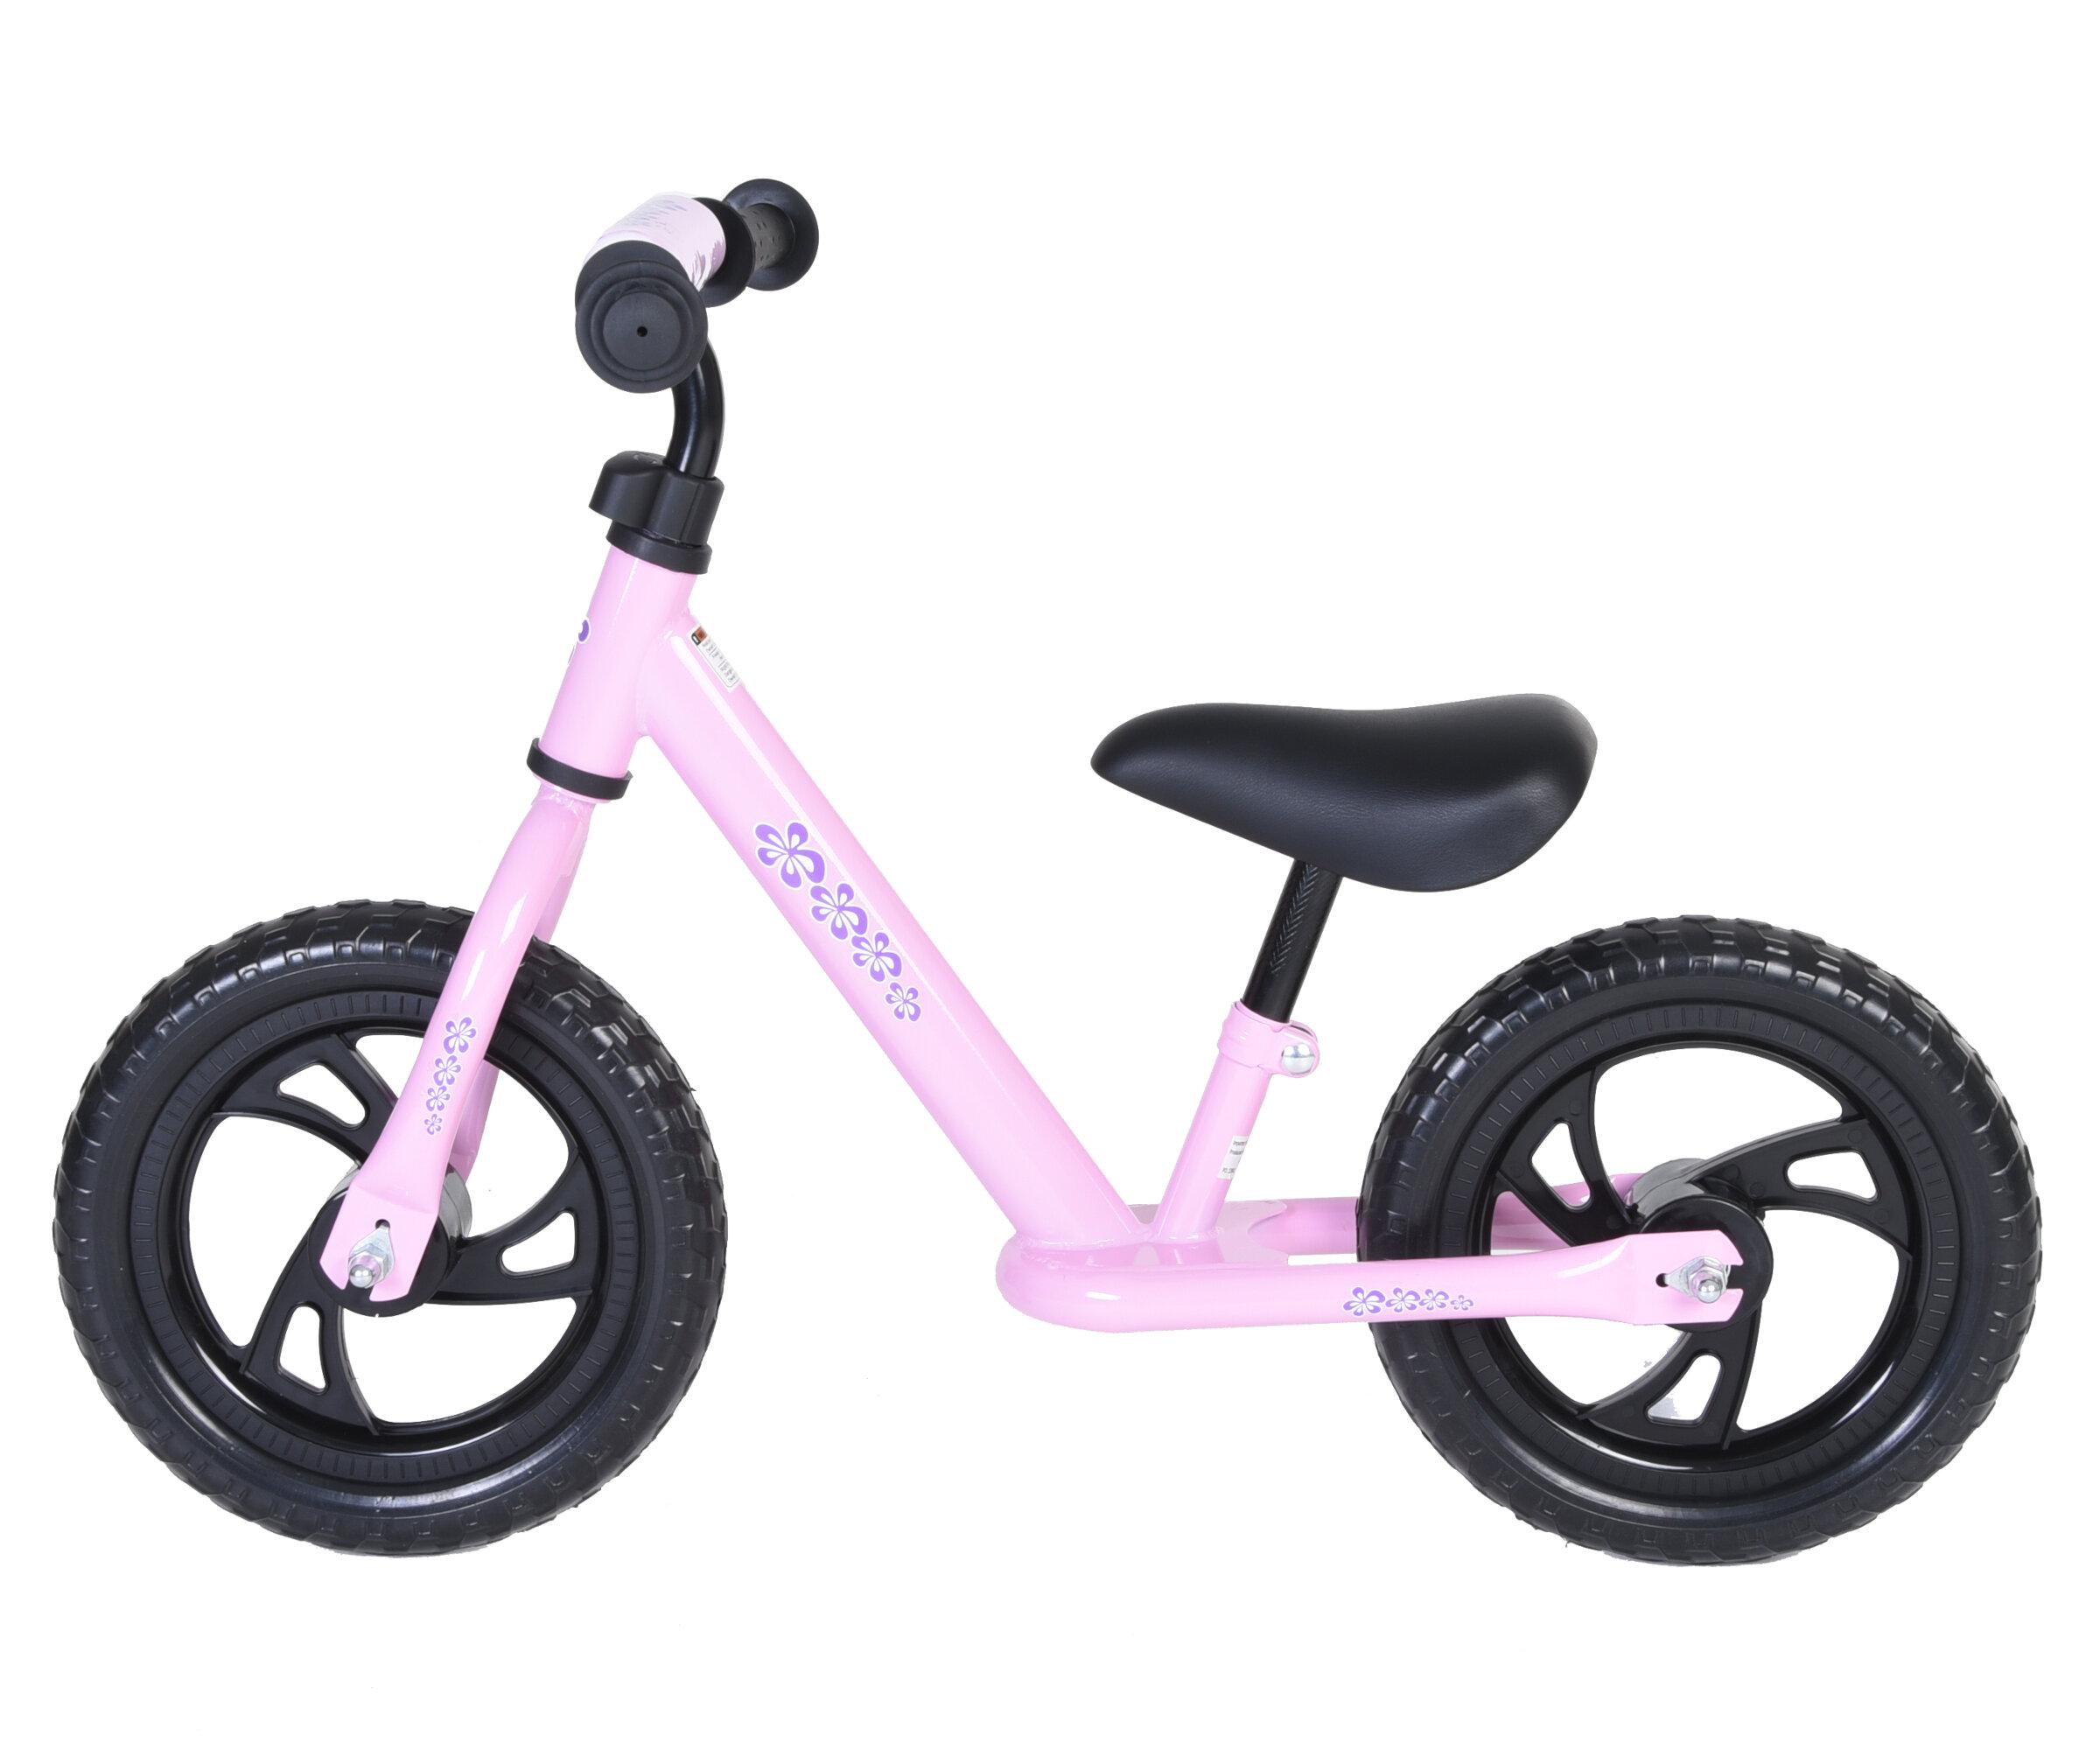 Vilano-Rally-Childrens-Balance-Bike-No-Pedal-Toddler-Push-Bicycle thumbnail 24